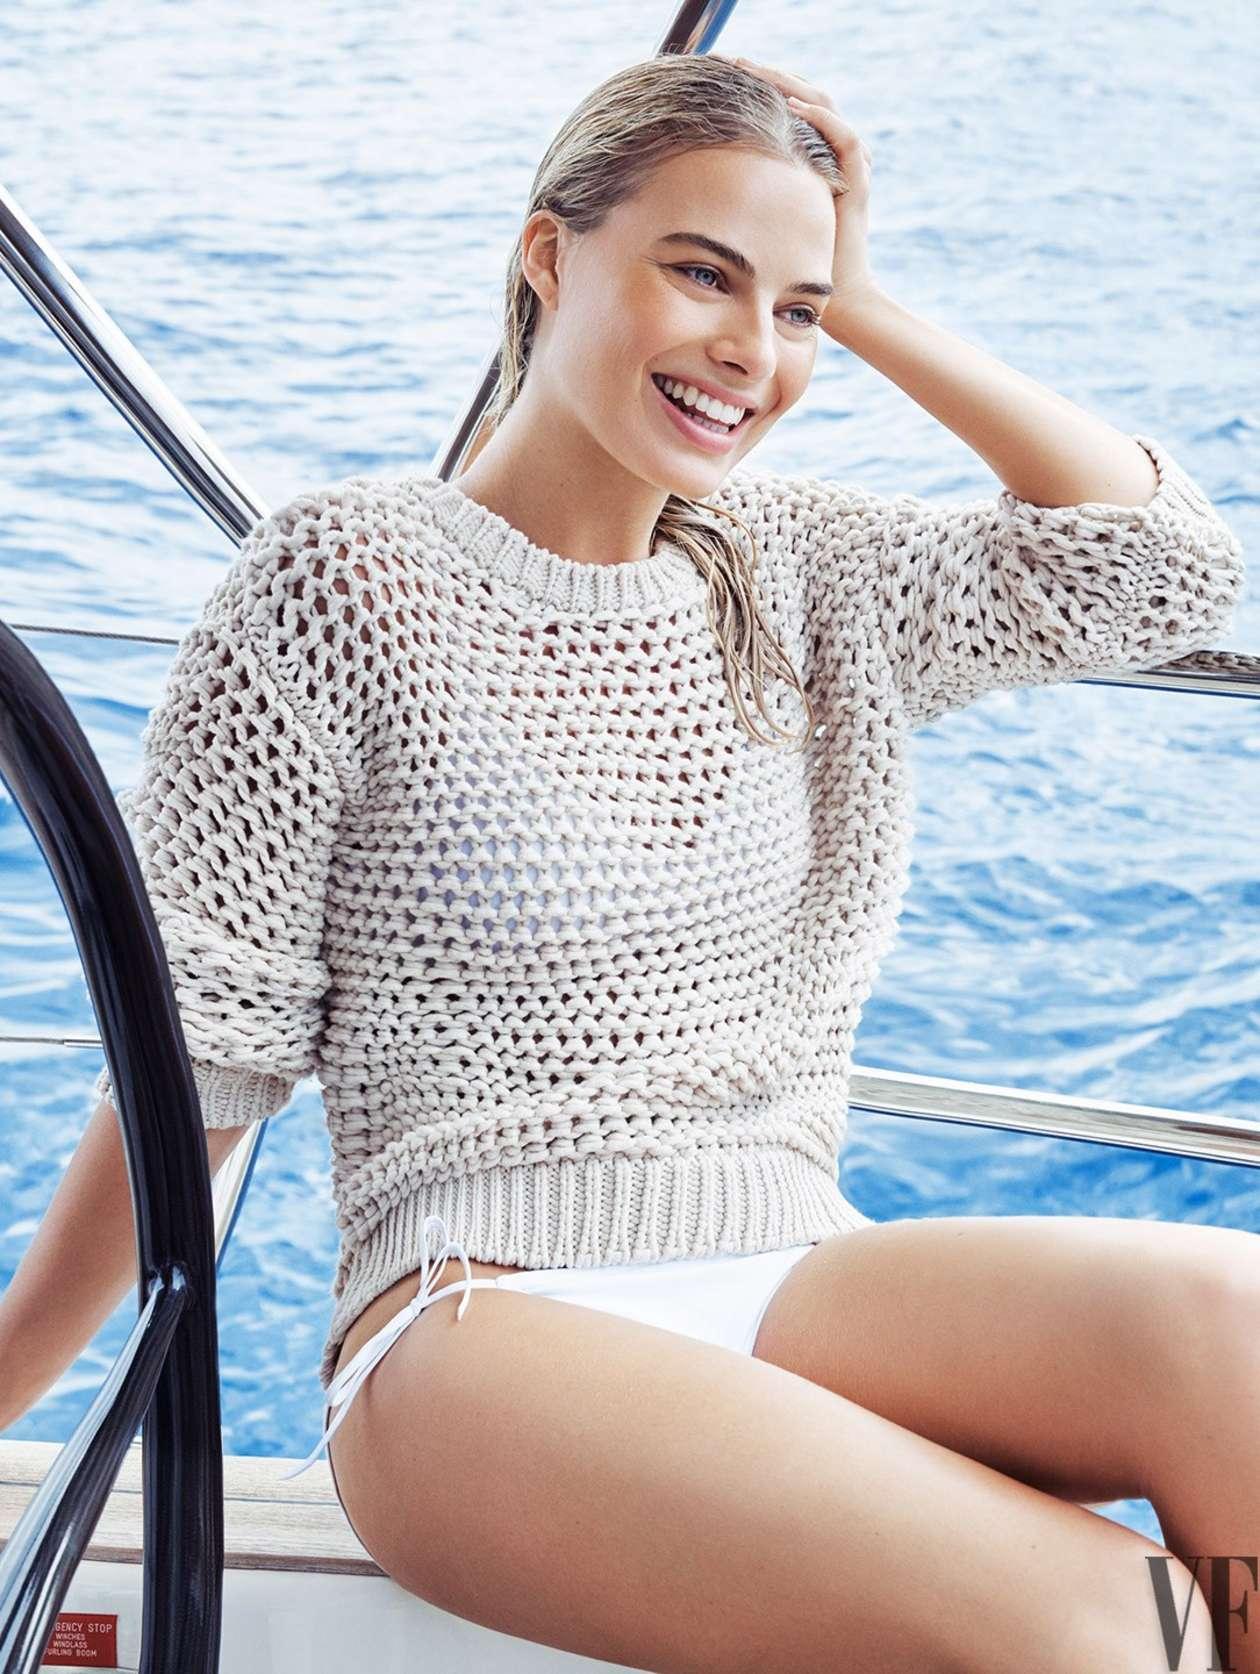 Margot Robbie - Vanity Fair Photoshoot - August 2016